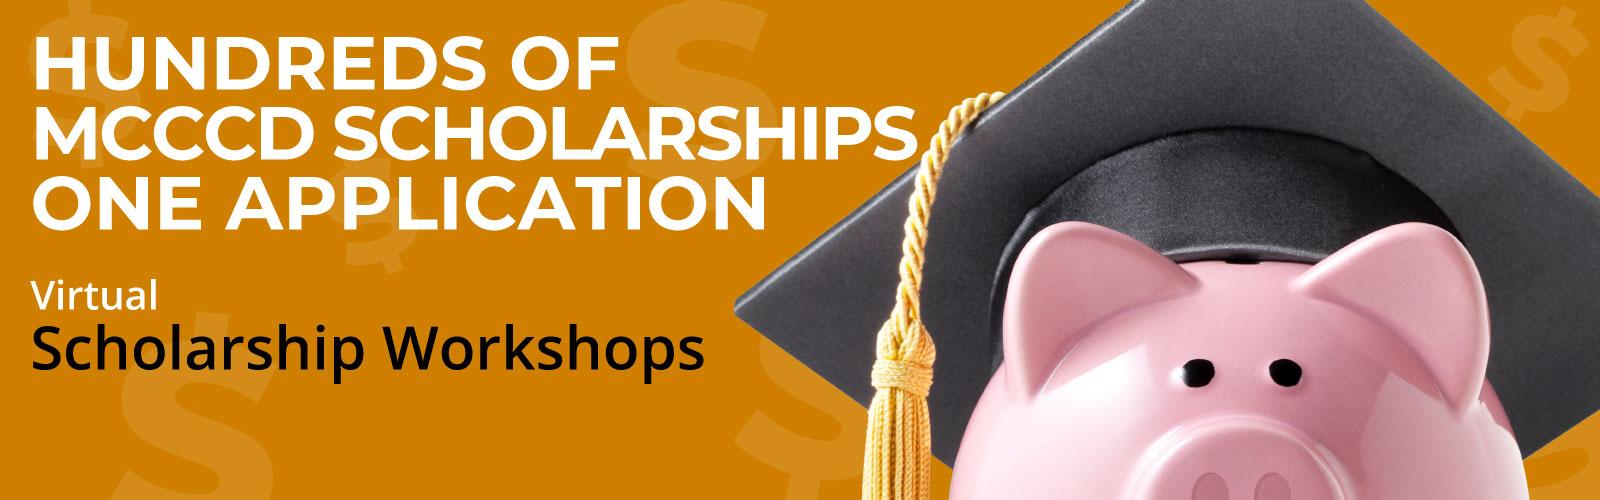 Scholarship workshops